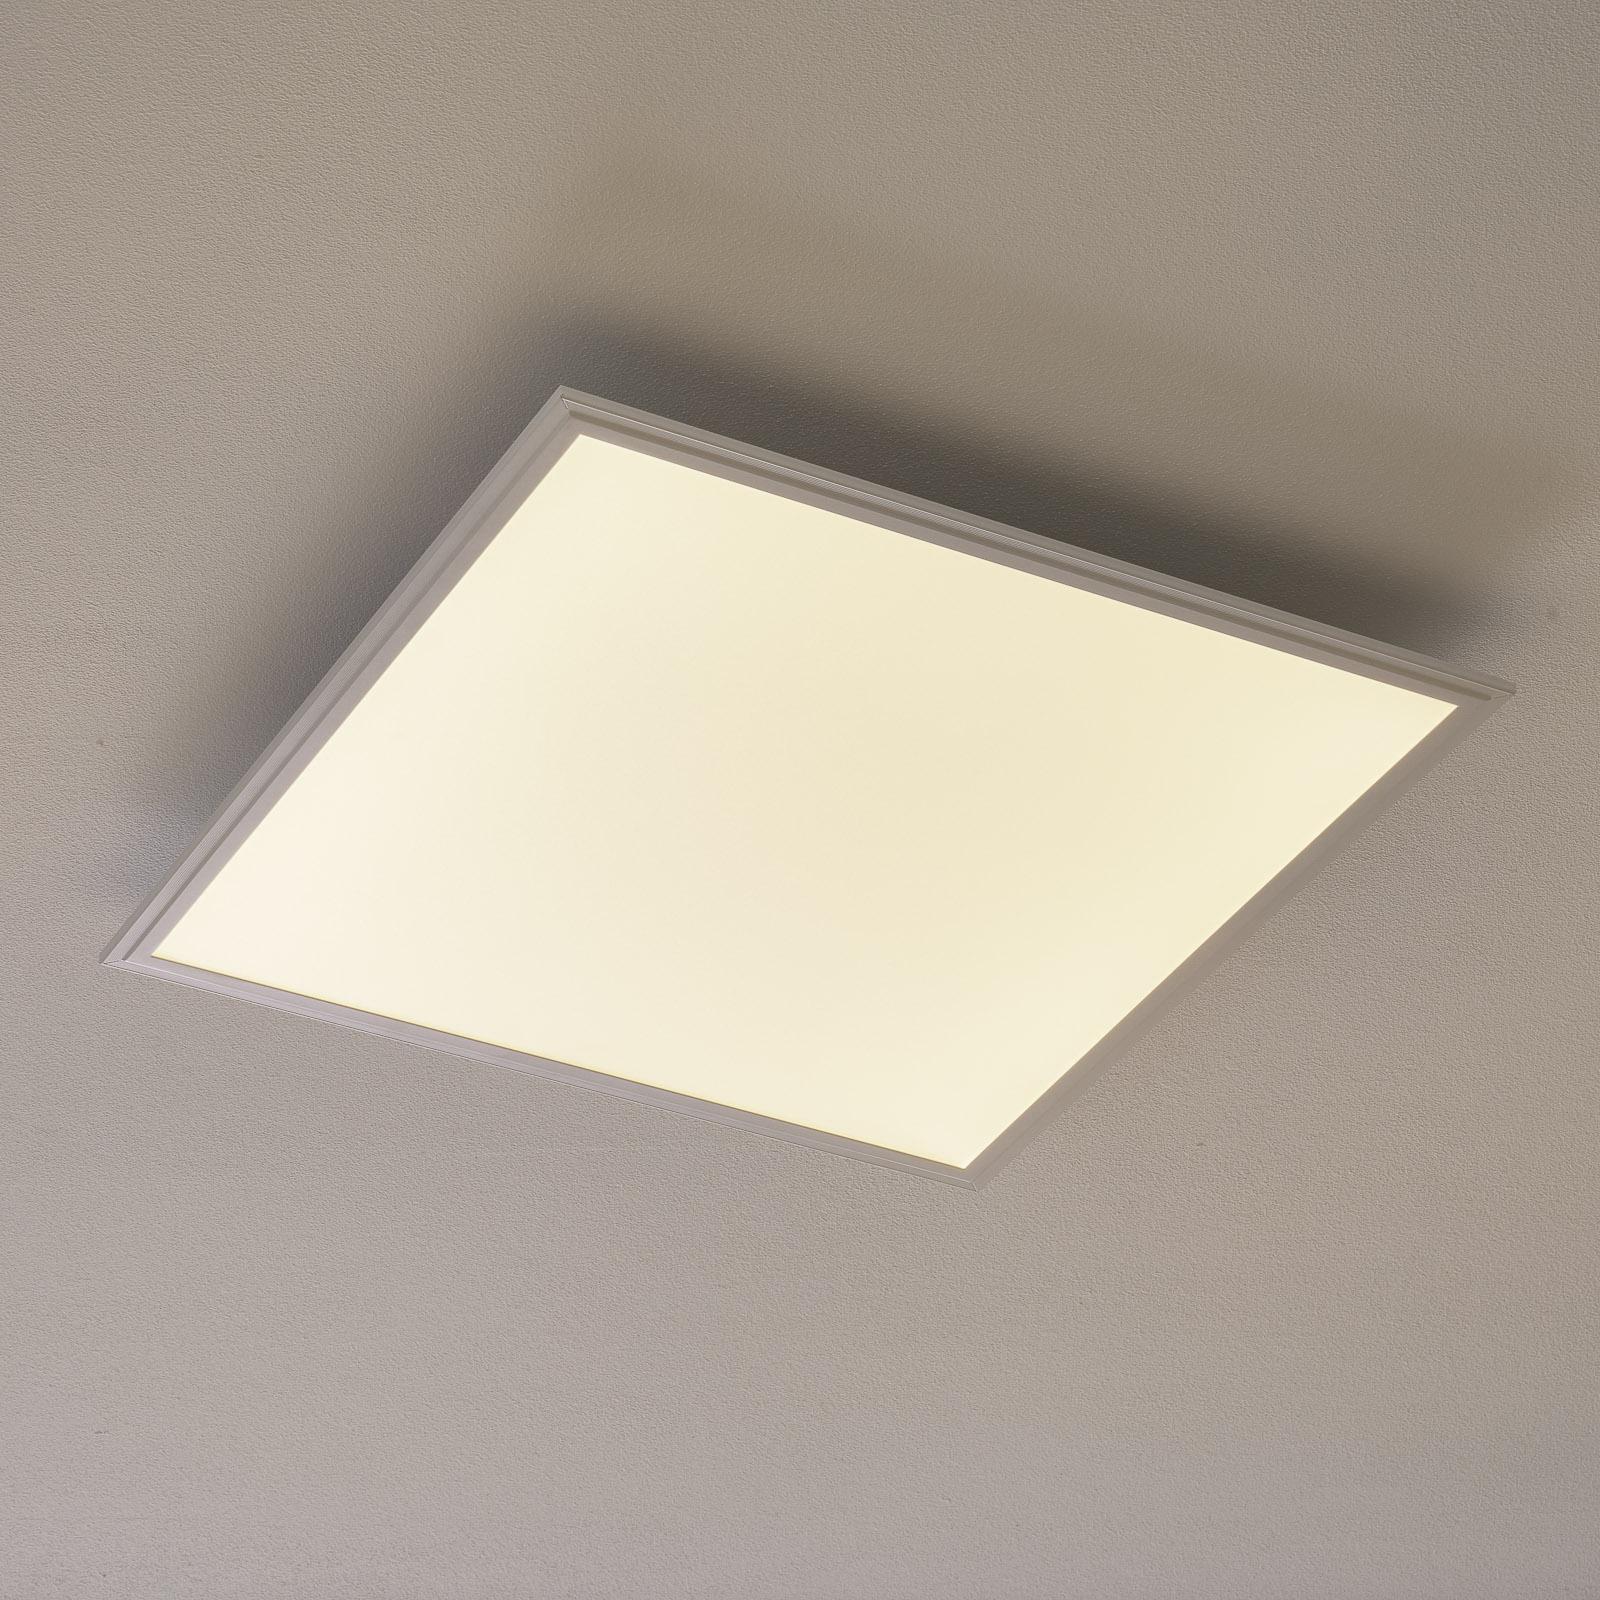 EGLO connect Salobrena-C LED-Panel 59x59cm weiß